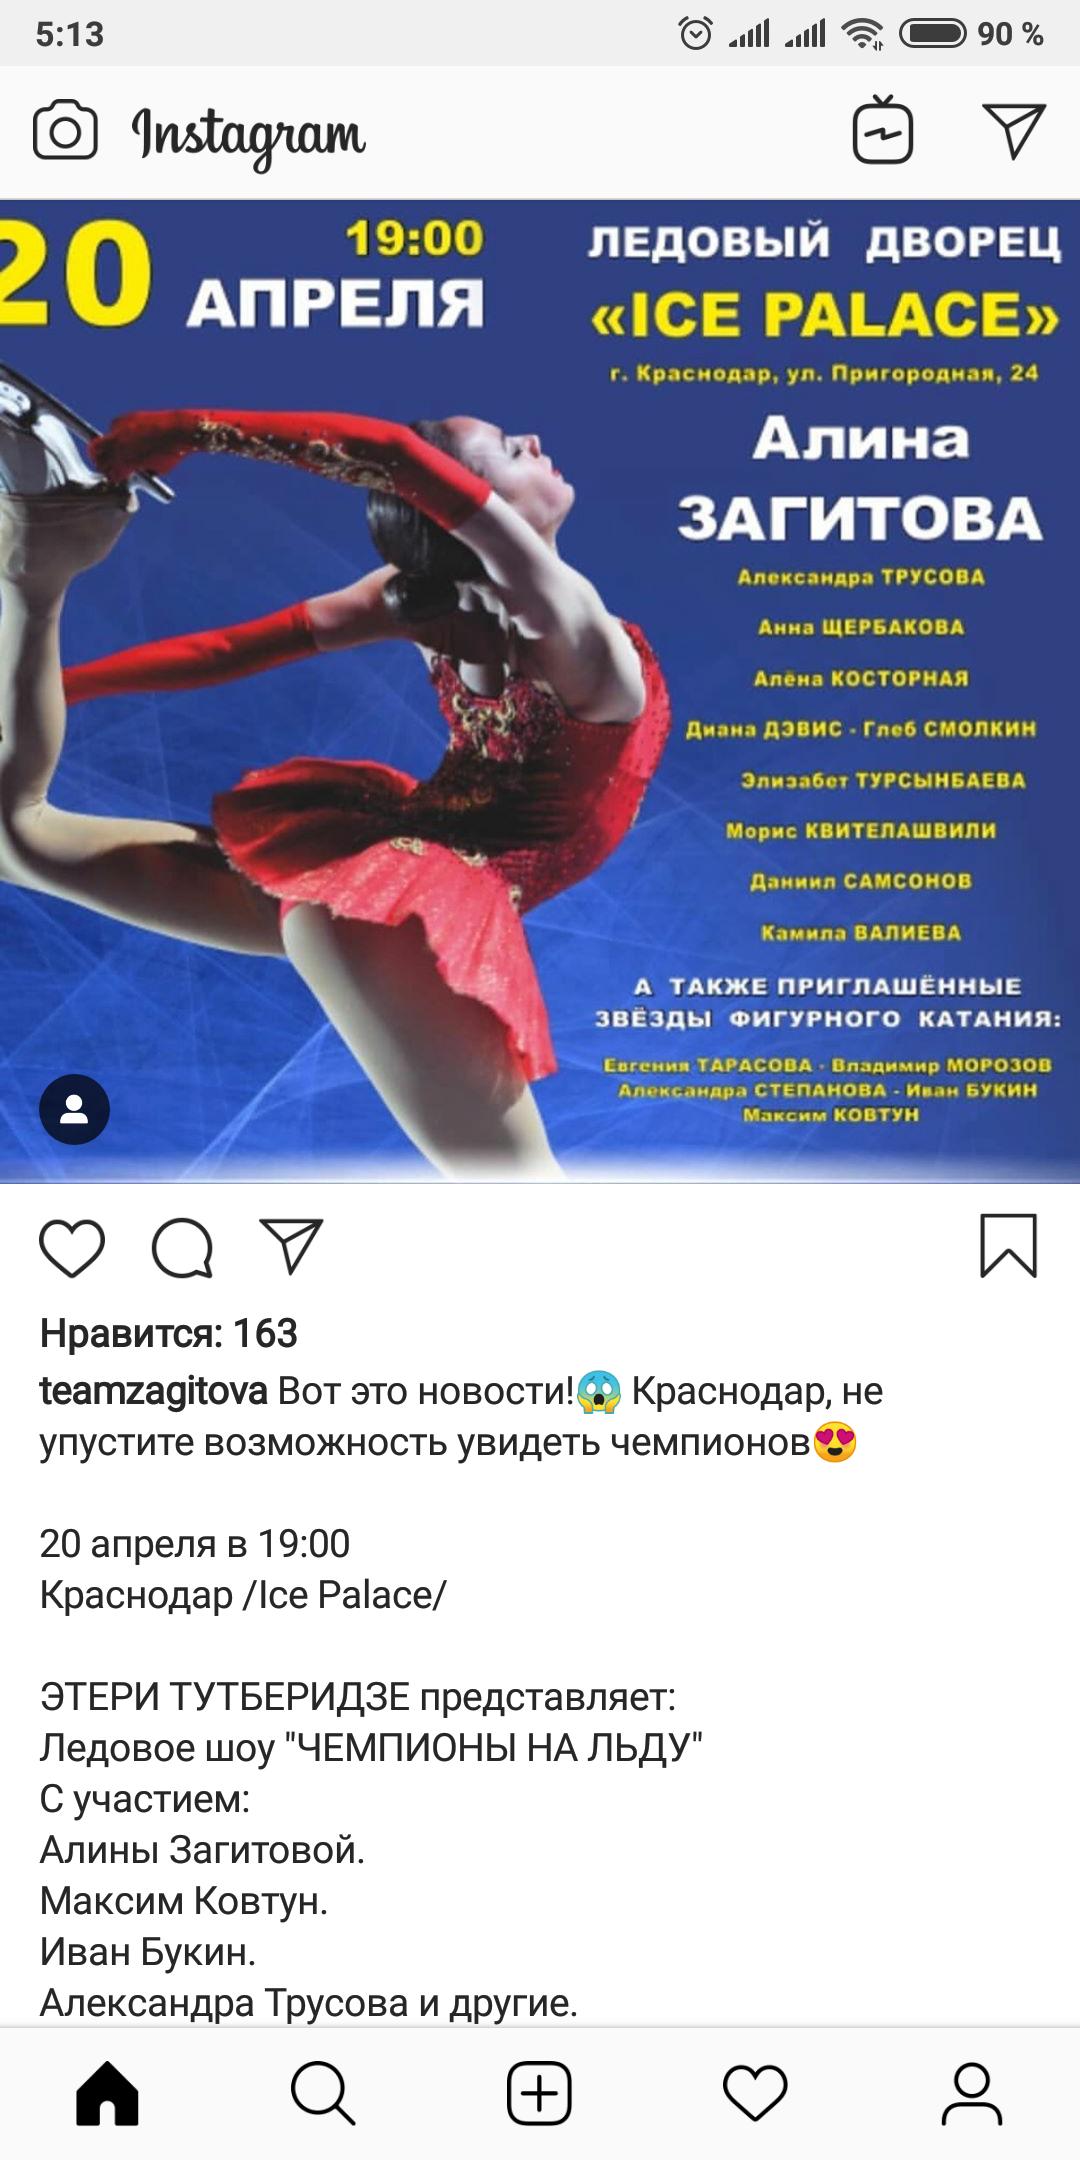 http://s3.uploads.ru/EaIb4.png